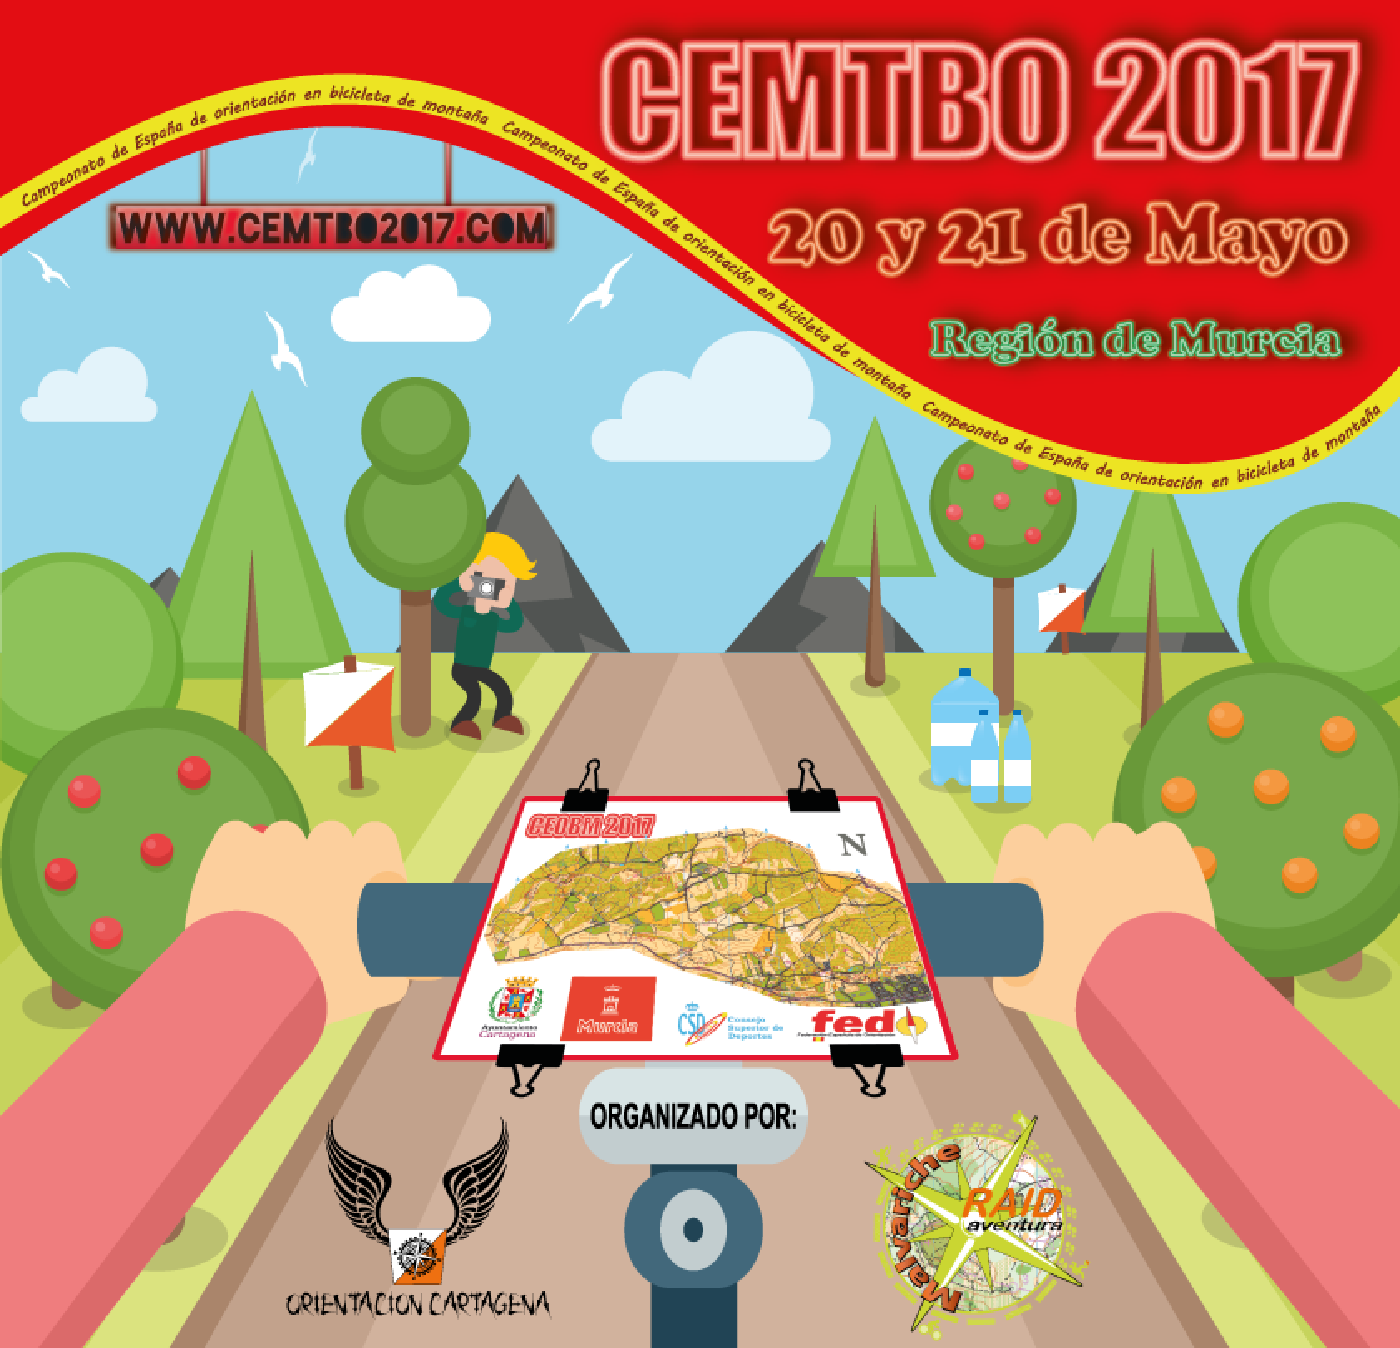 CEMTBO 2017